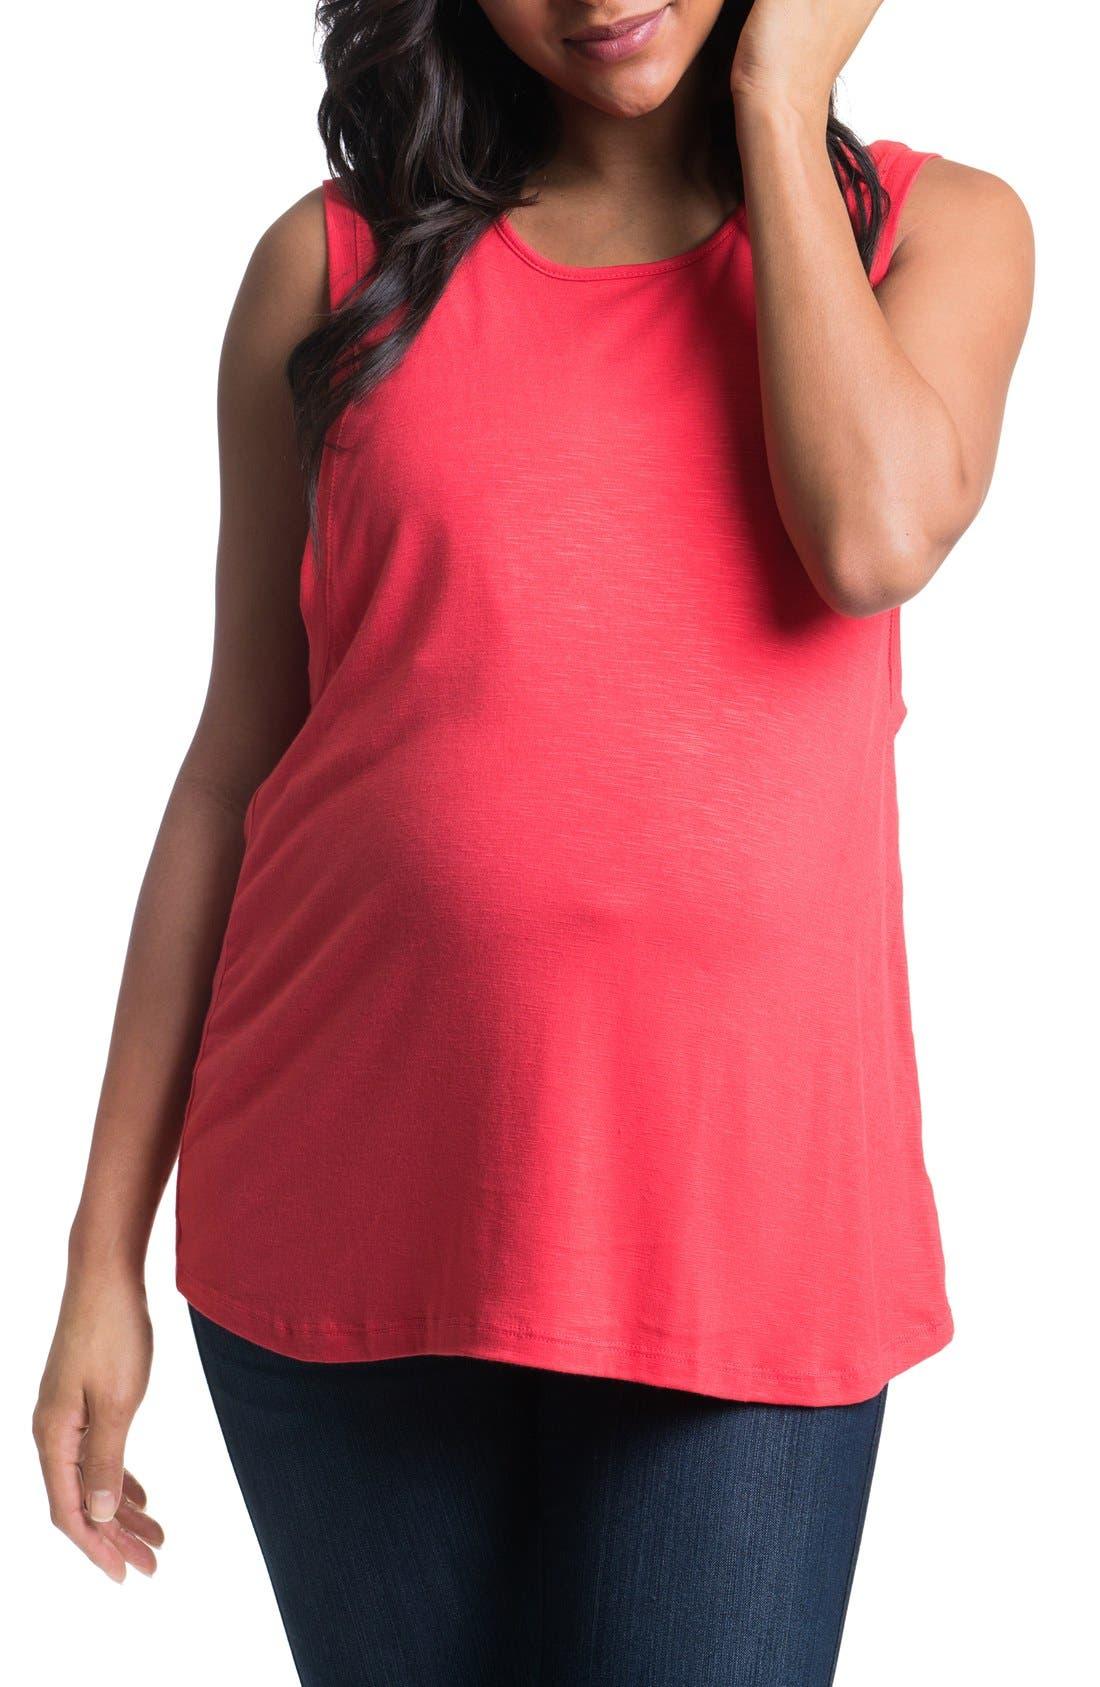 Bun Maternity High Neck Maternity Tank